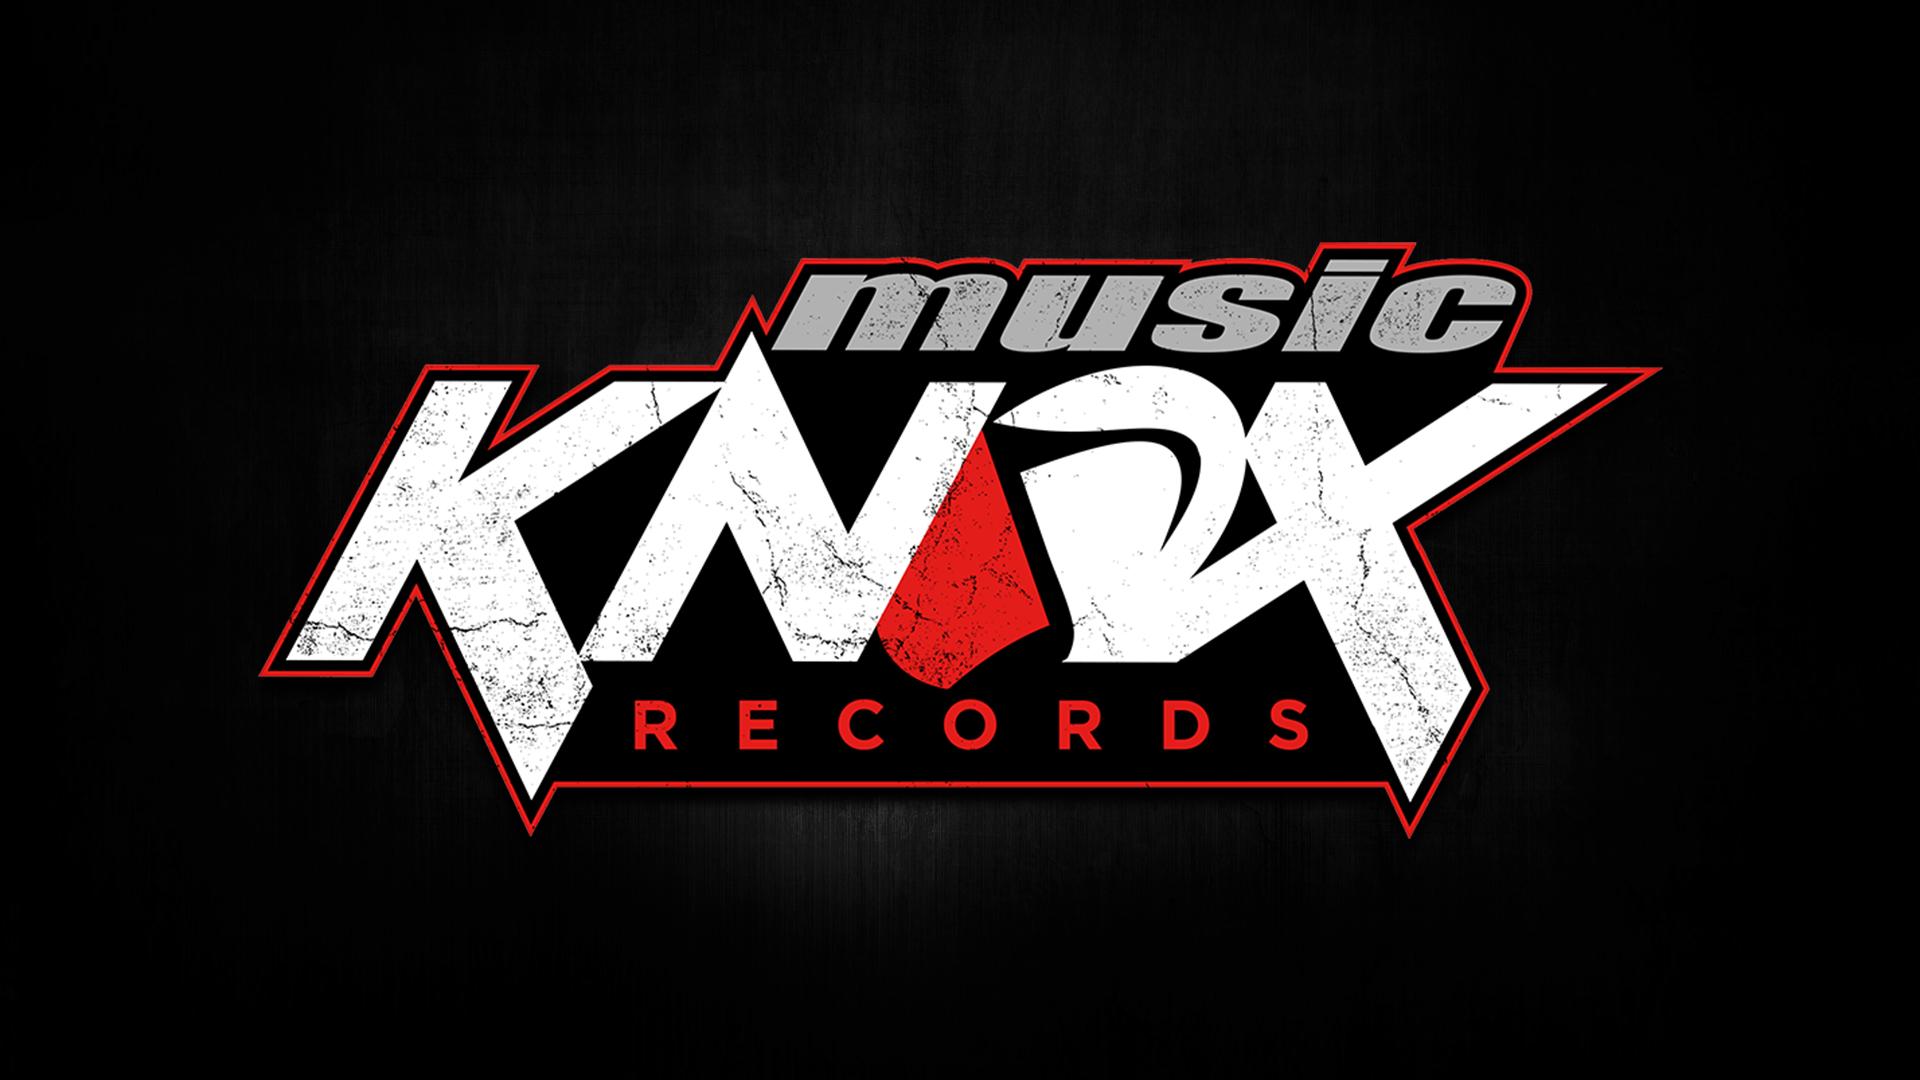 MusicKnox Records Web Banner